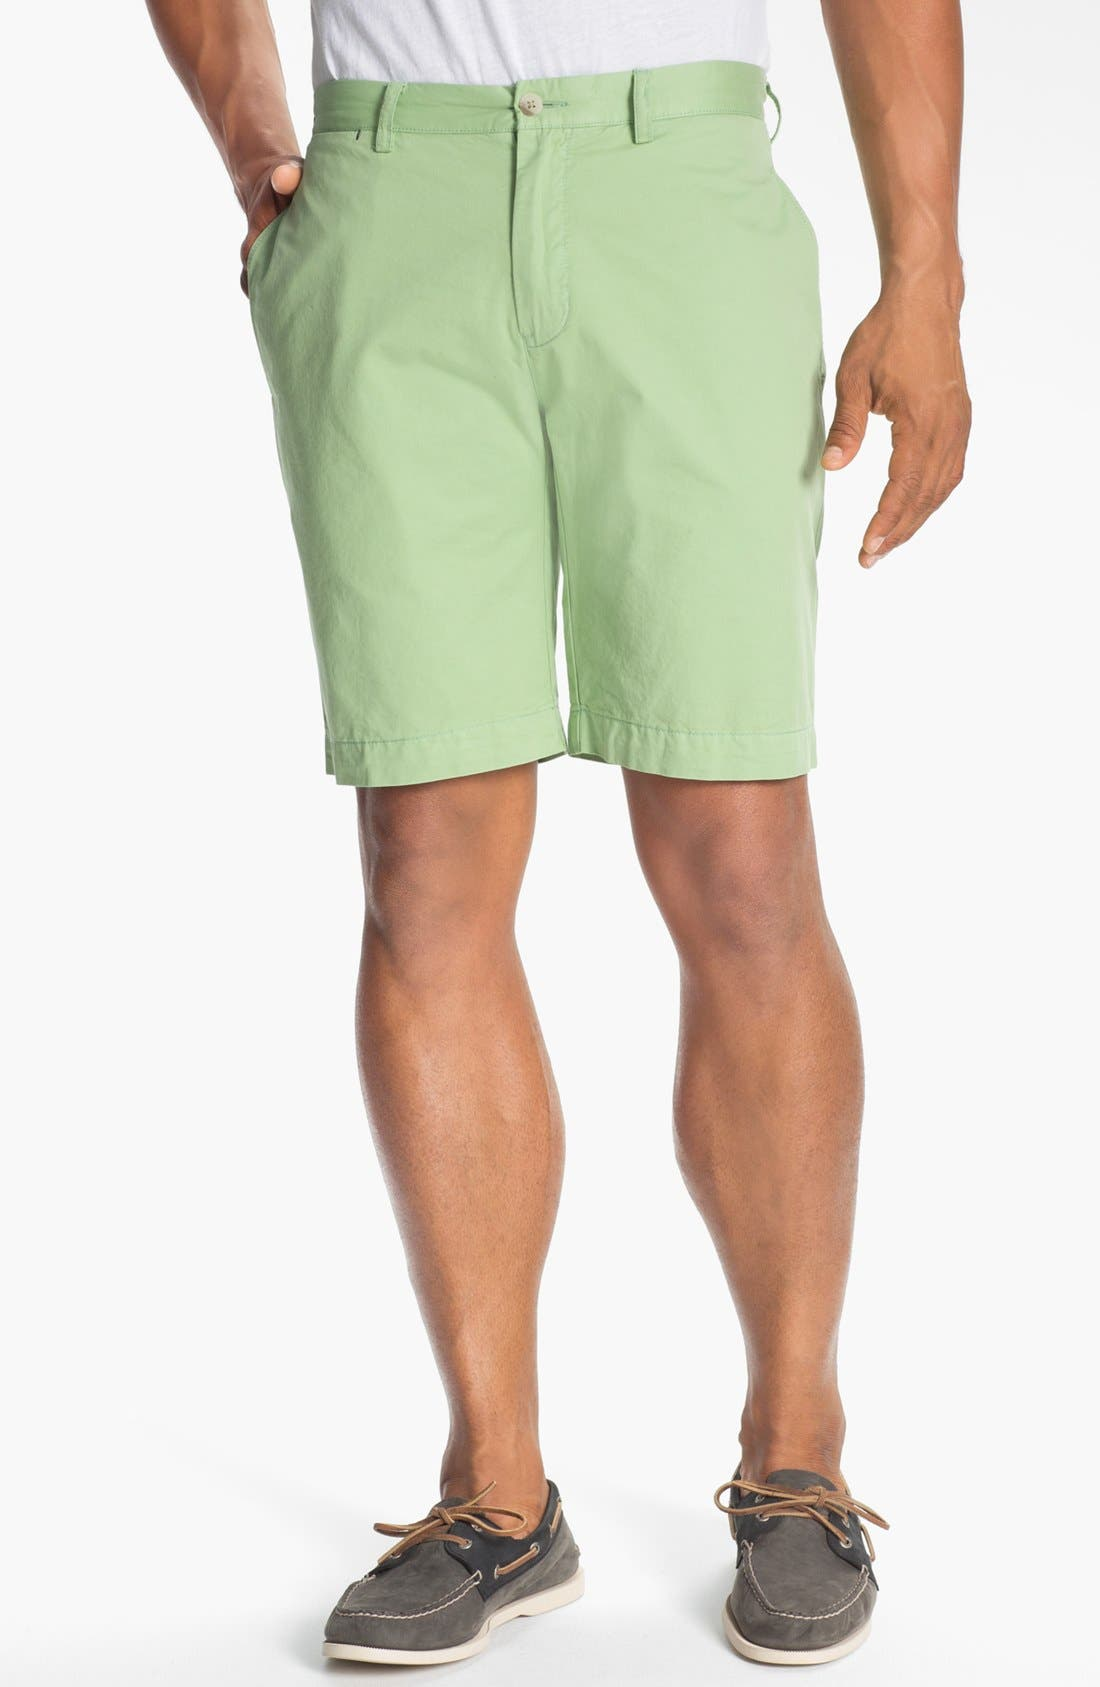 Alternate Image 1 Selected - Maker & Company Twill Shorts